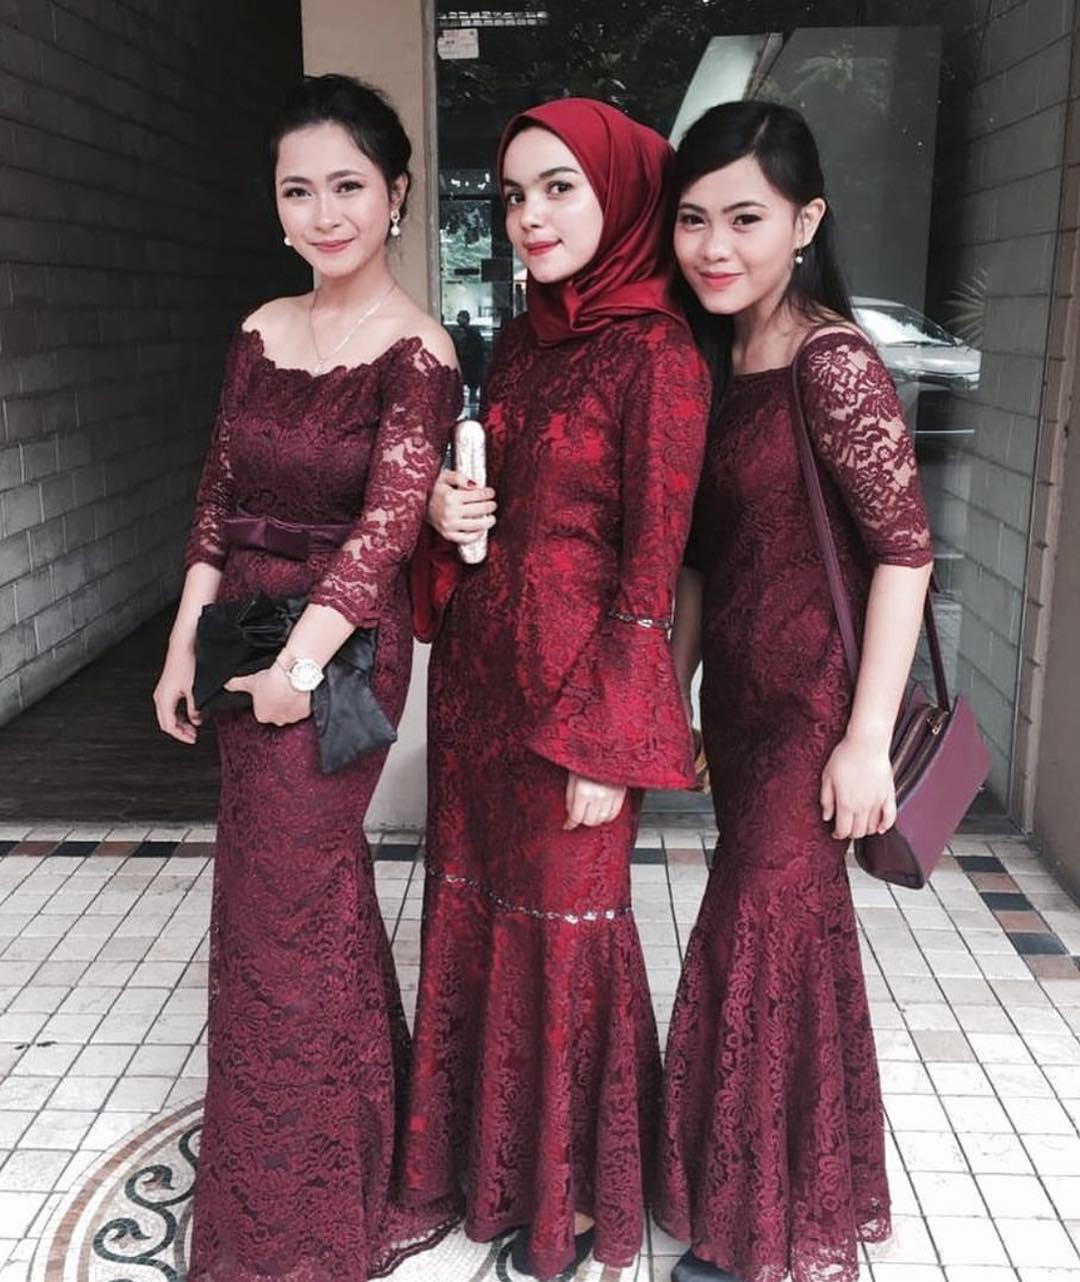 Contoh Gambar Baju Batik Modern: 57 Kumpulan Gambar Inspirasi Kebaya Modern Indonesia